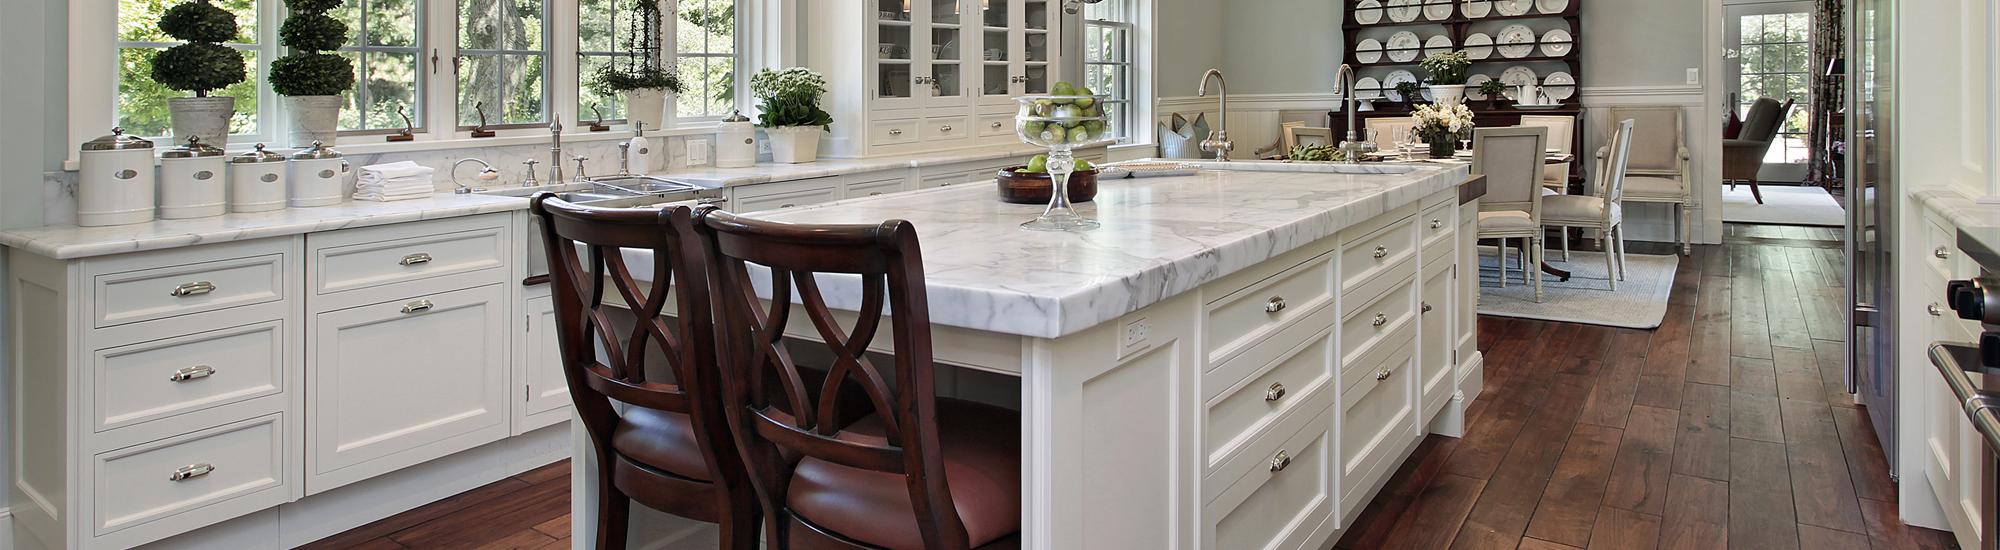 Wholesale Kitchen Cabinets St Louis MO